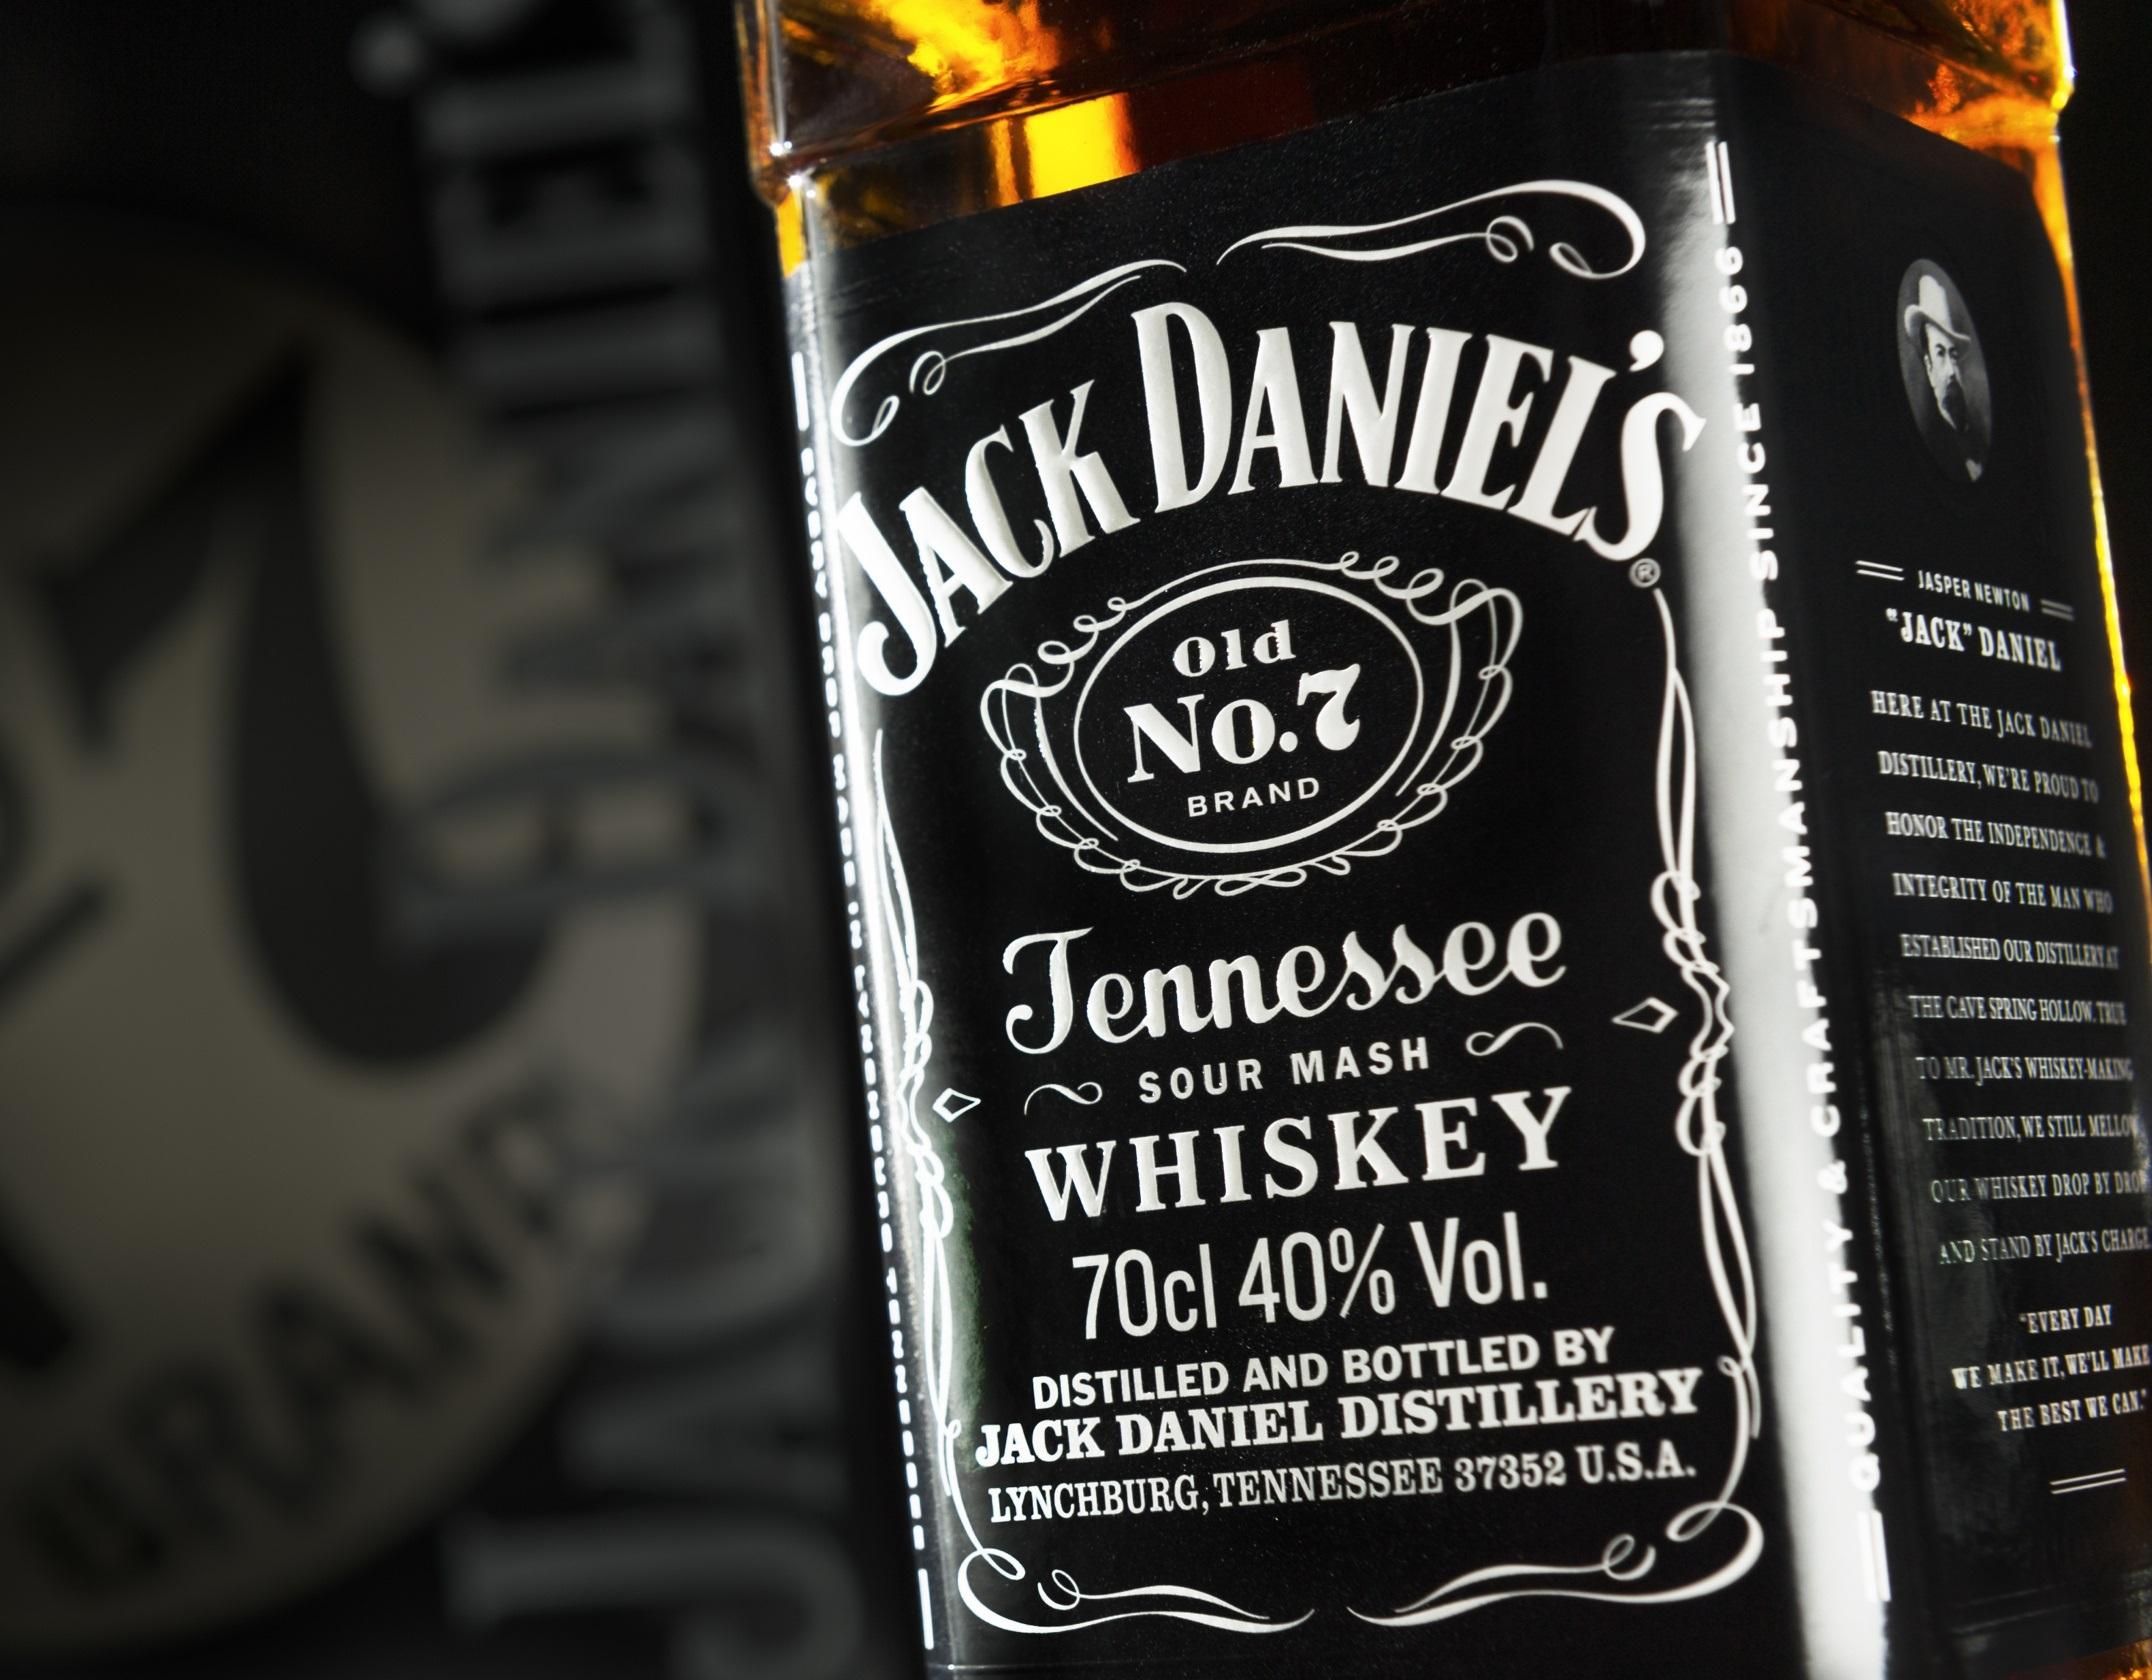 Jack Daniels High Definition Wallpapers